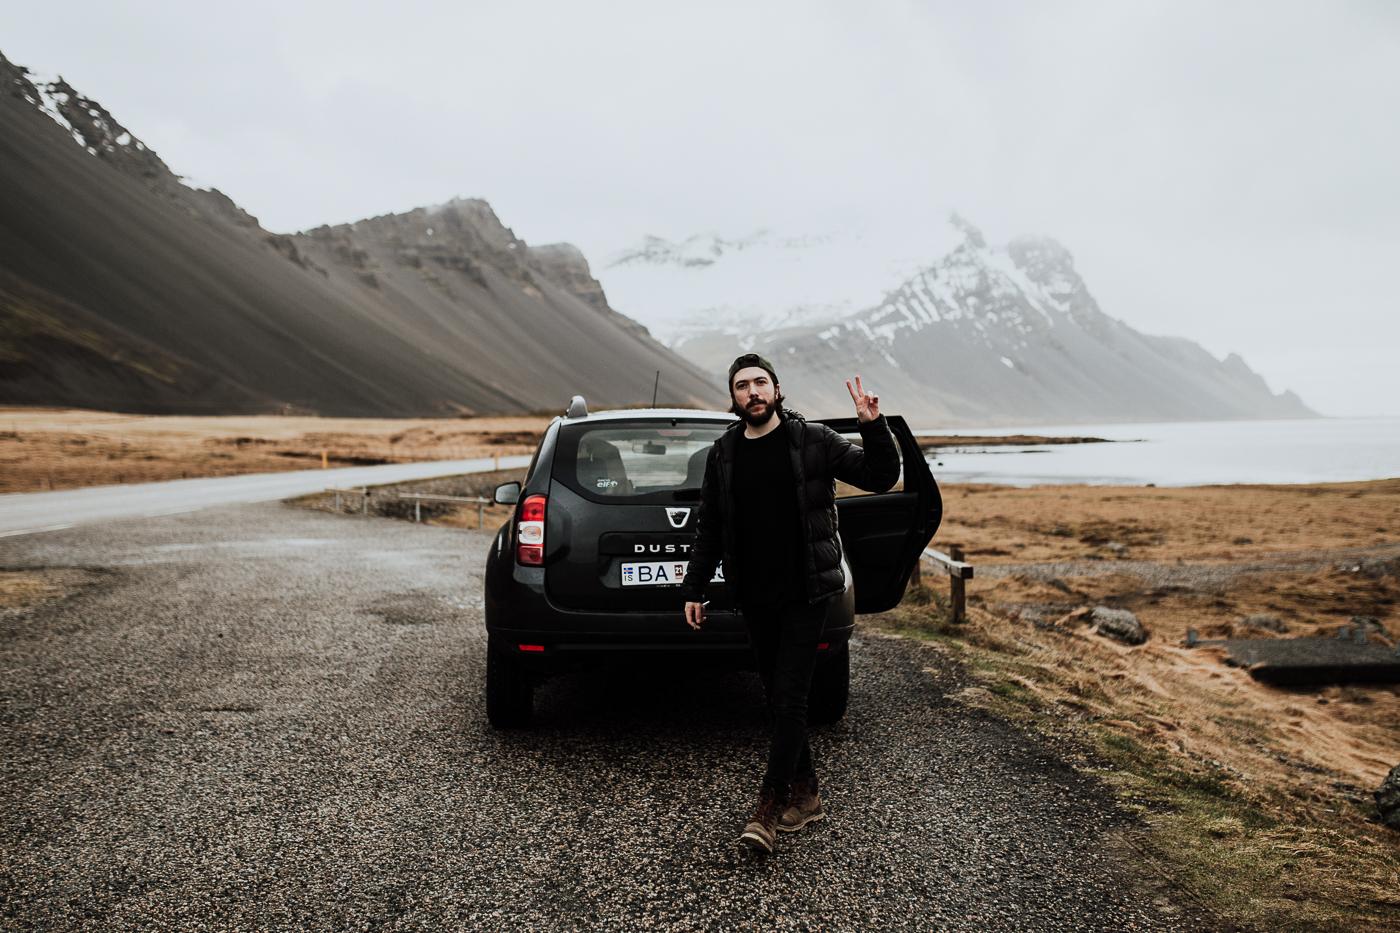 Superfex_Iceland_Travel_Blog_036.jpg